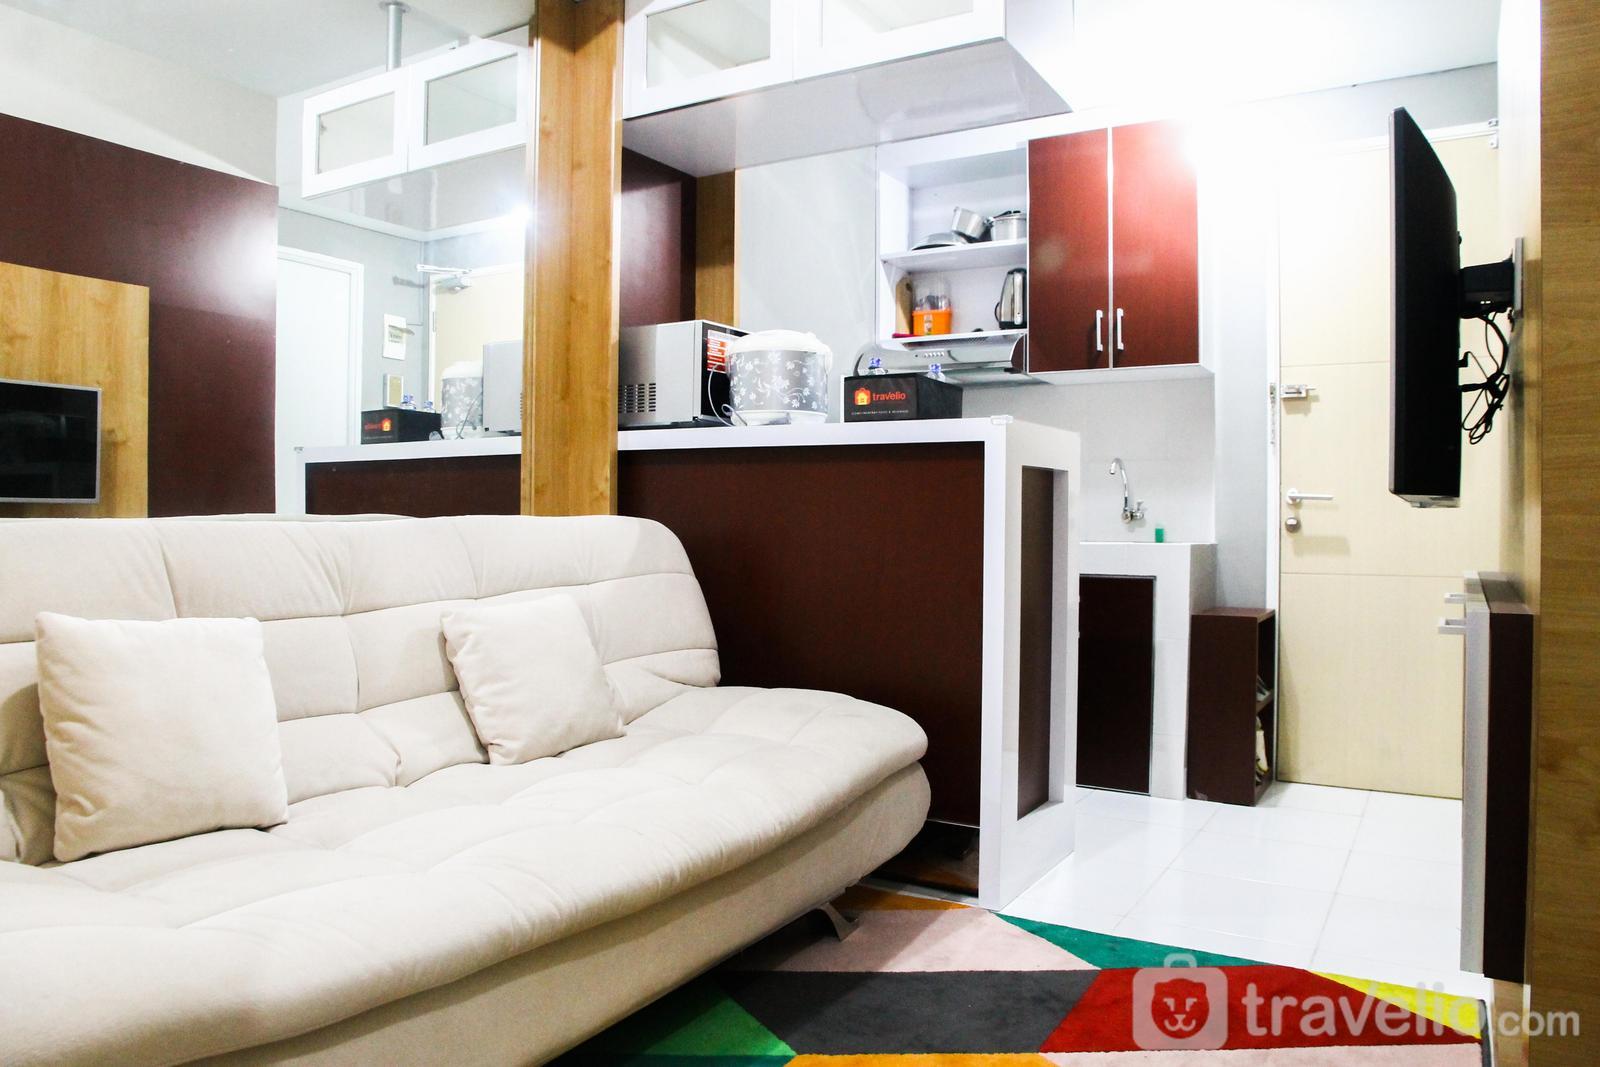 Ayodhya Residence Tangerang - Strategic 2BR Ayodhya Apartment By Travelio